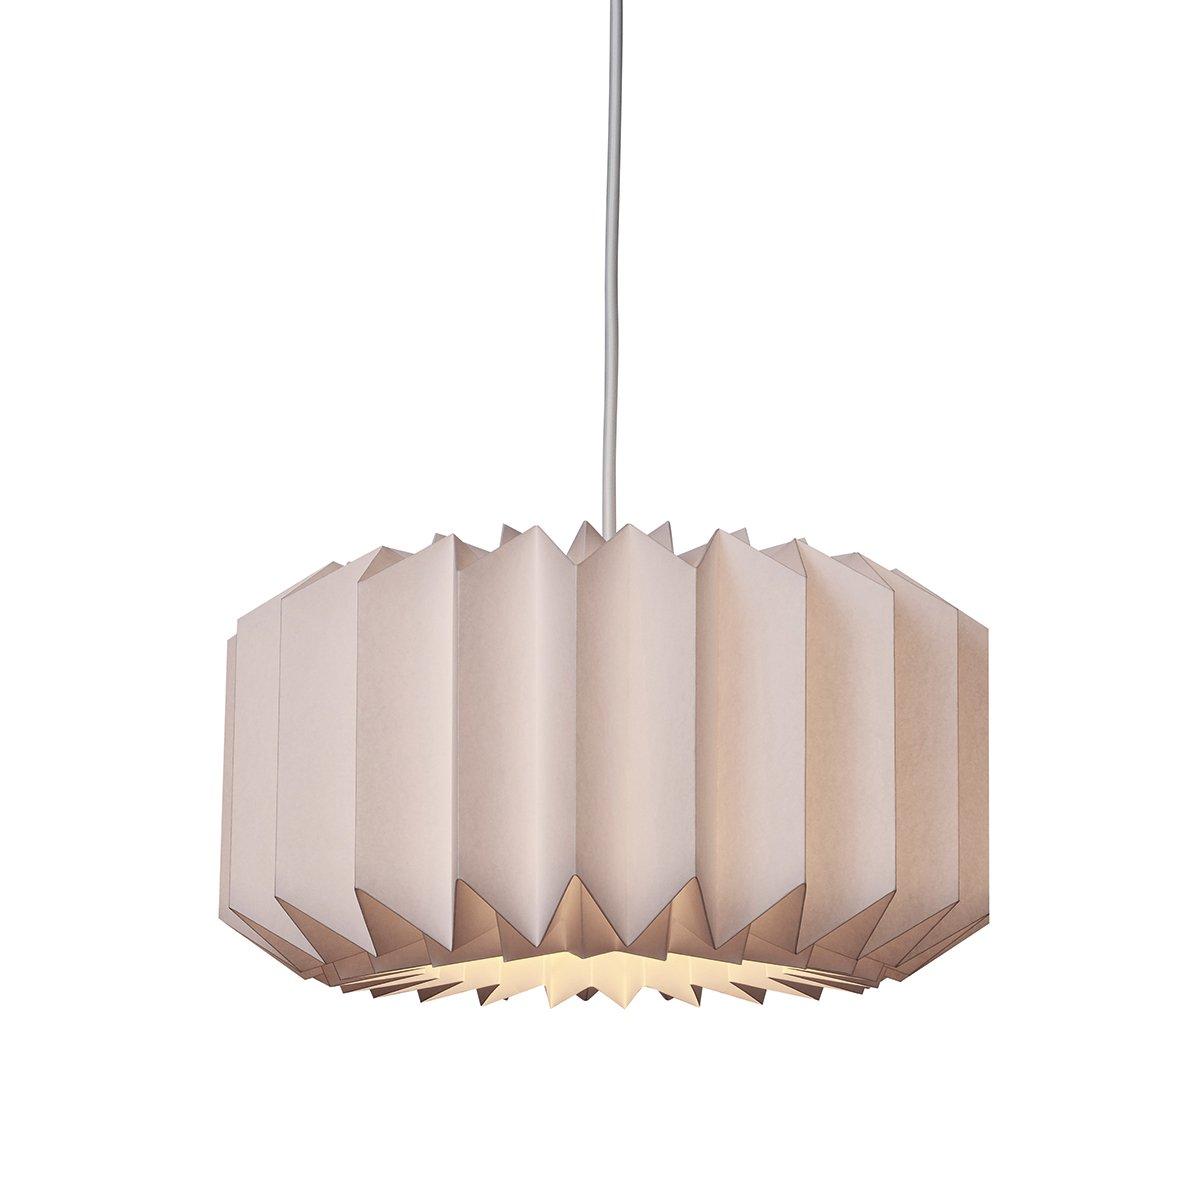 LE KLINT PLEATS Model 154 Hanglamp Silk White - Small